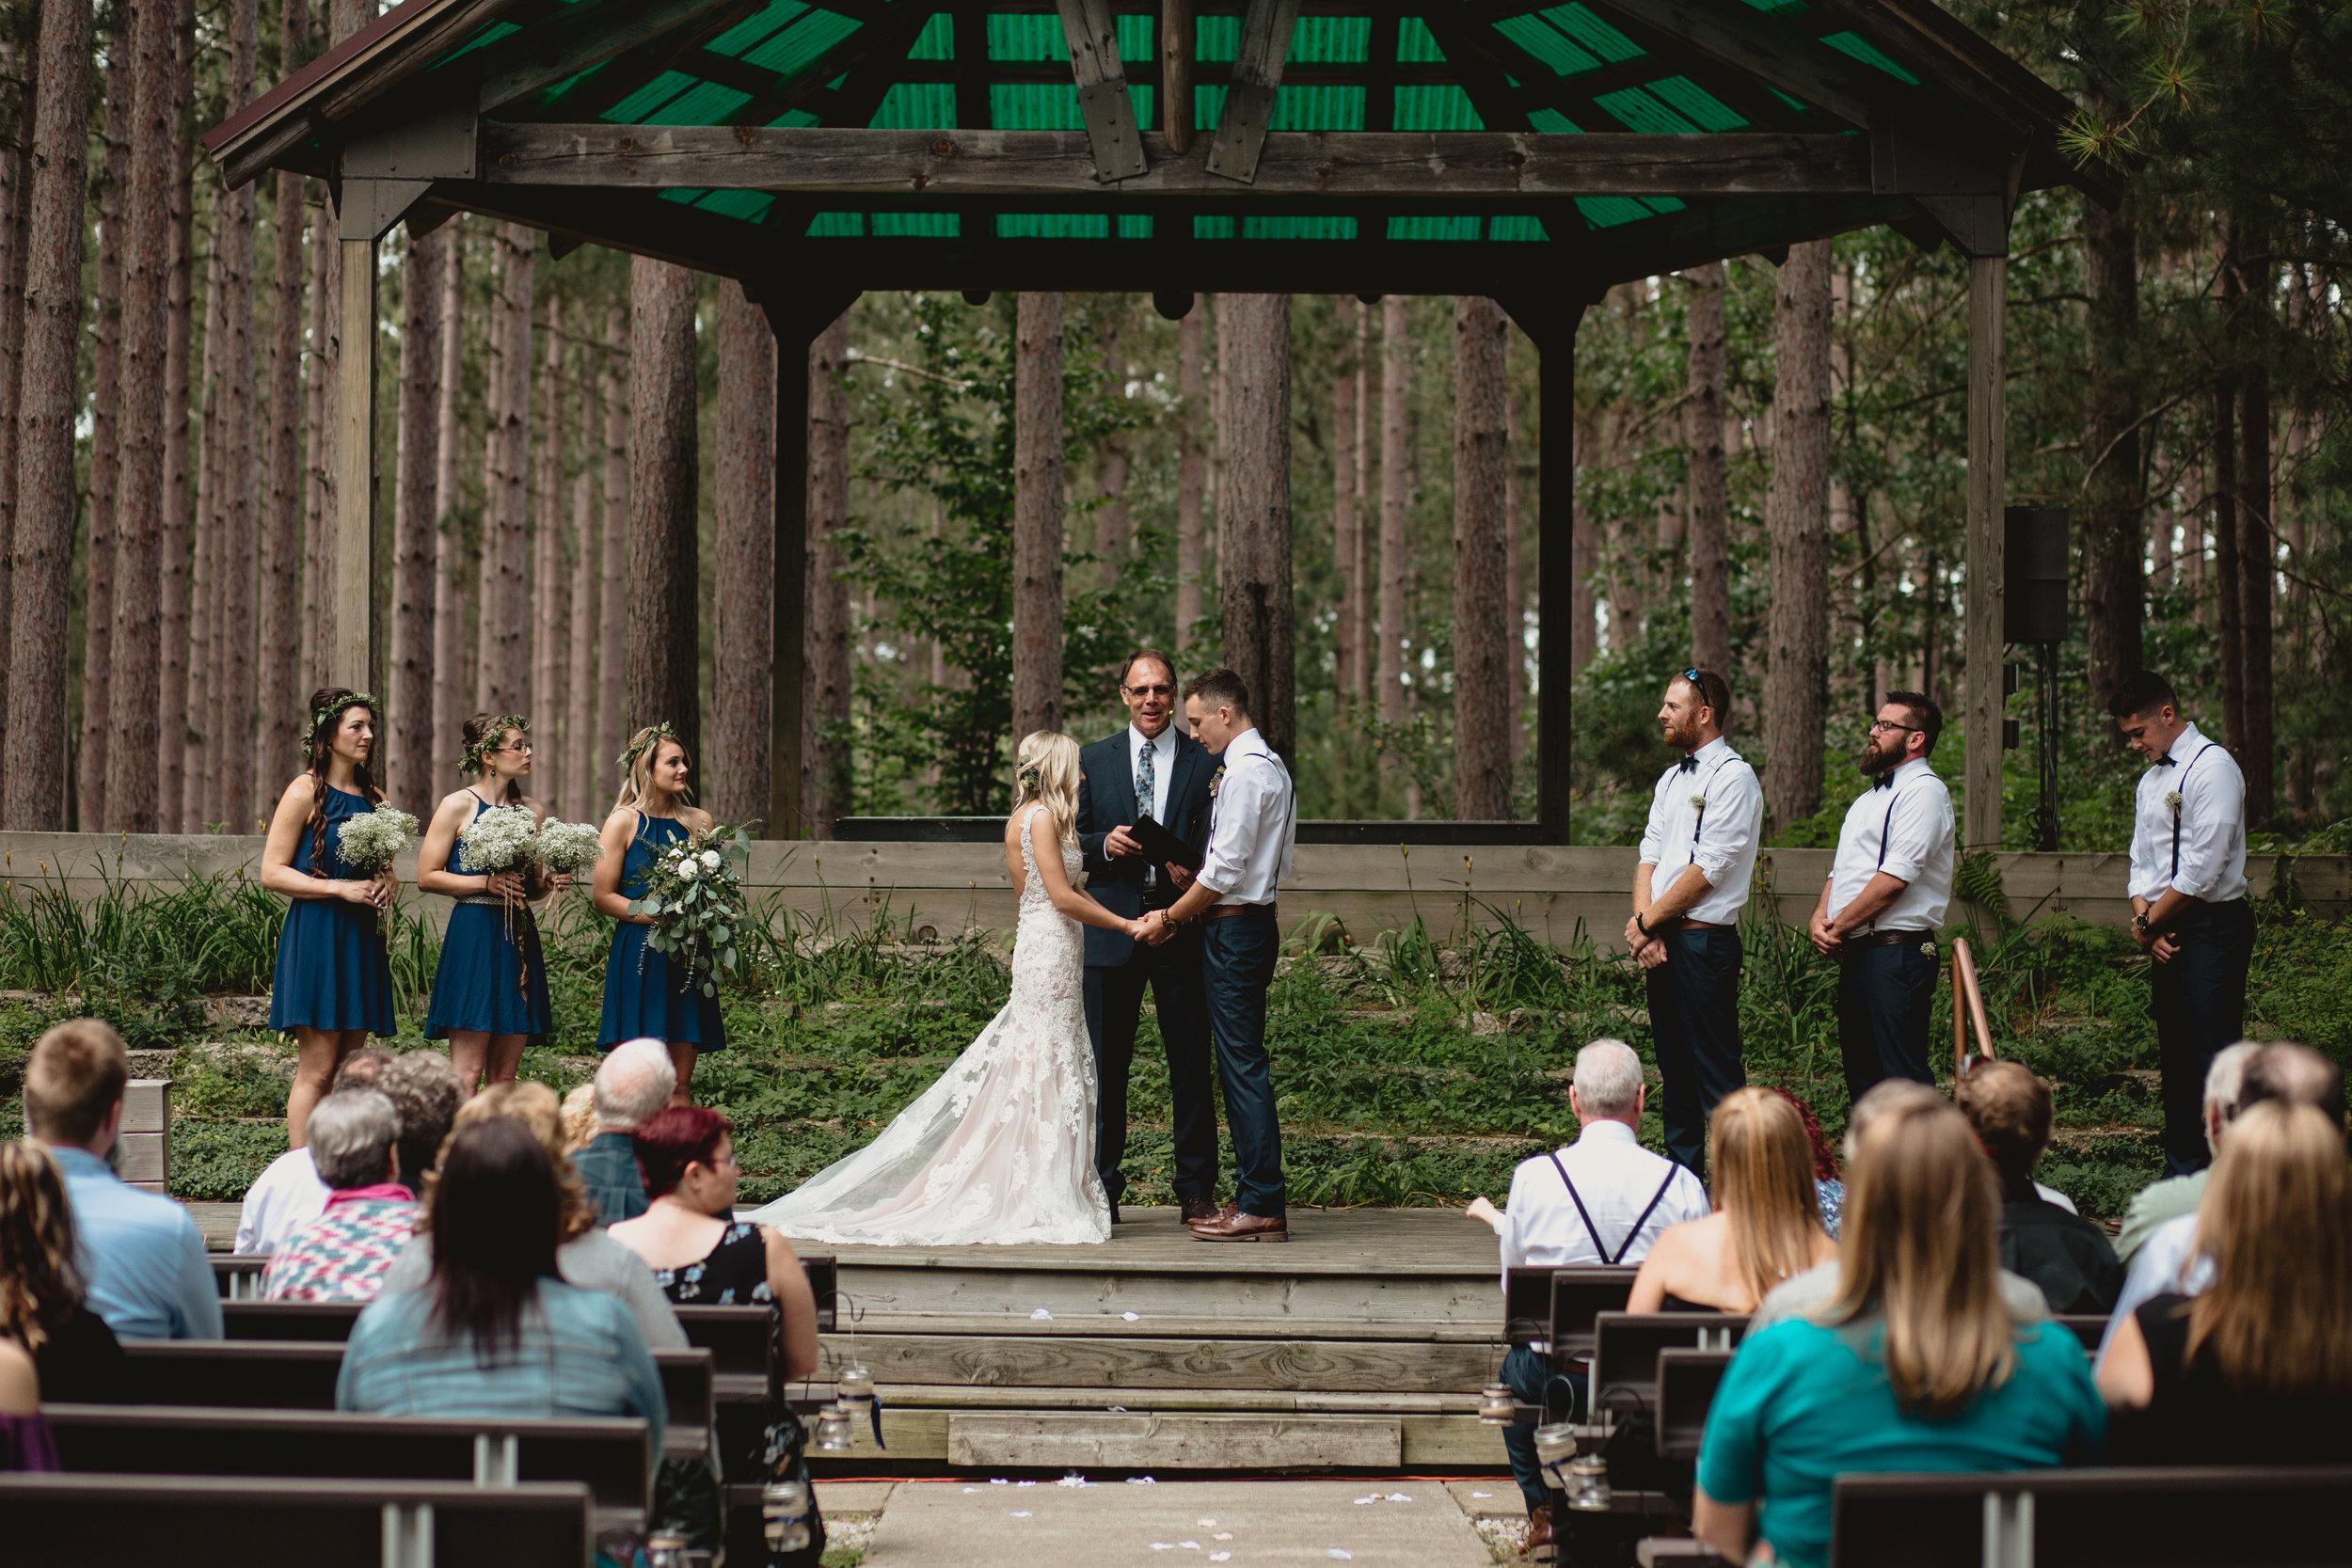 west-michigan-wedding-photographer-whitehall-rachel-austin-chapel-in-the-pines-275.jpg